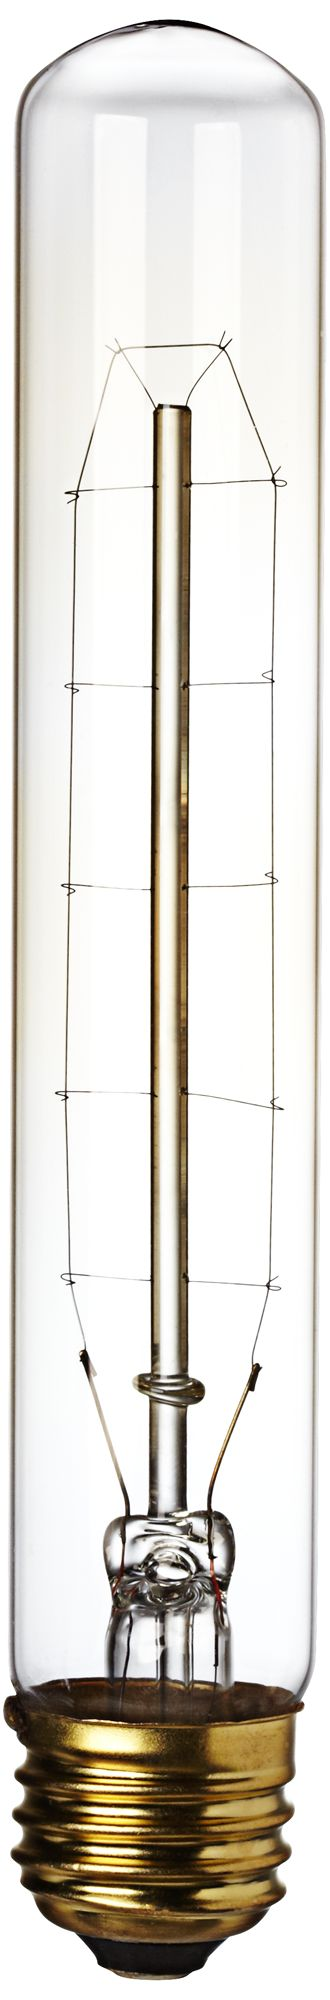 Vintage Style Edison 30 Watt T9 Tube Light Bulb